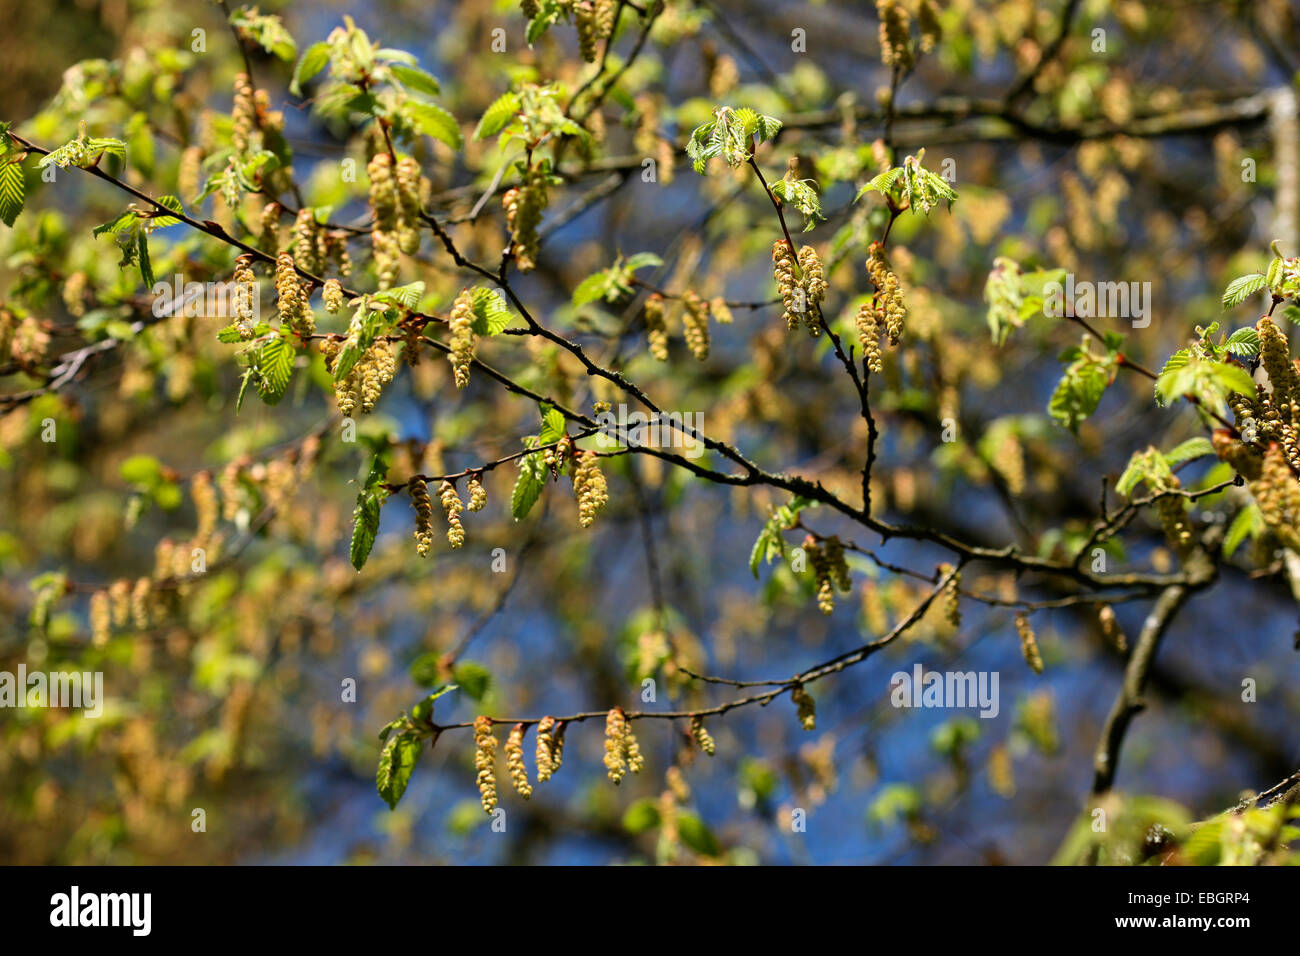 carpinus betulus tree abundant drooping pods in Spring  Jane Ann Butler Photography JABP1389 - Stock Image